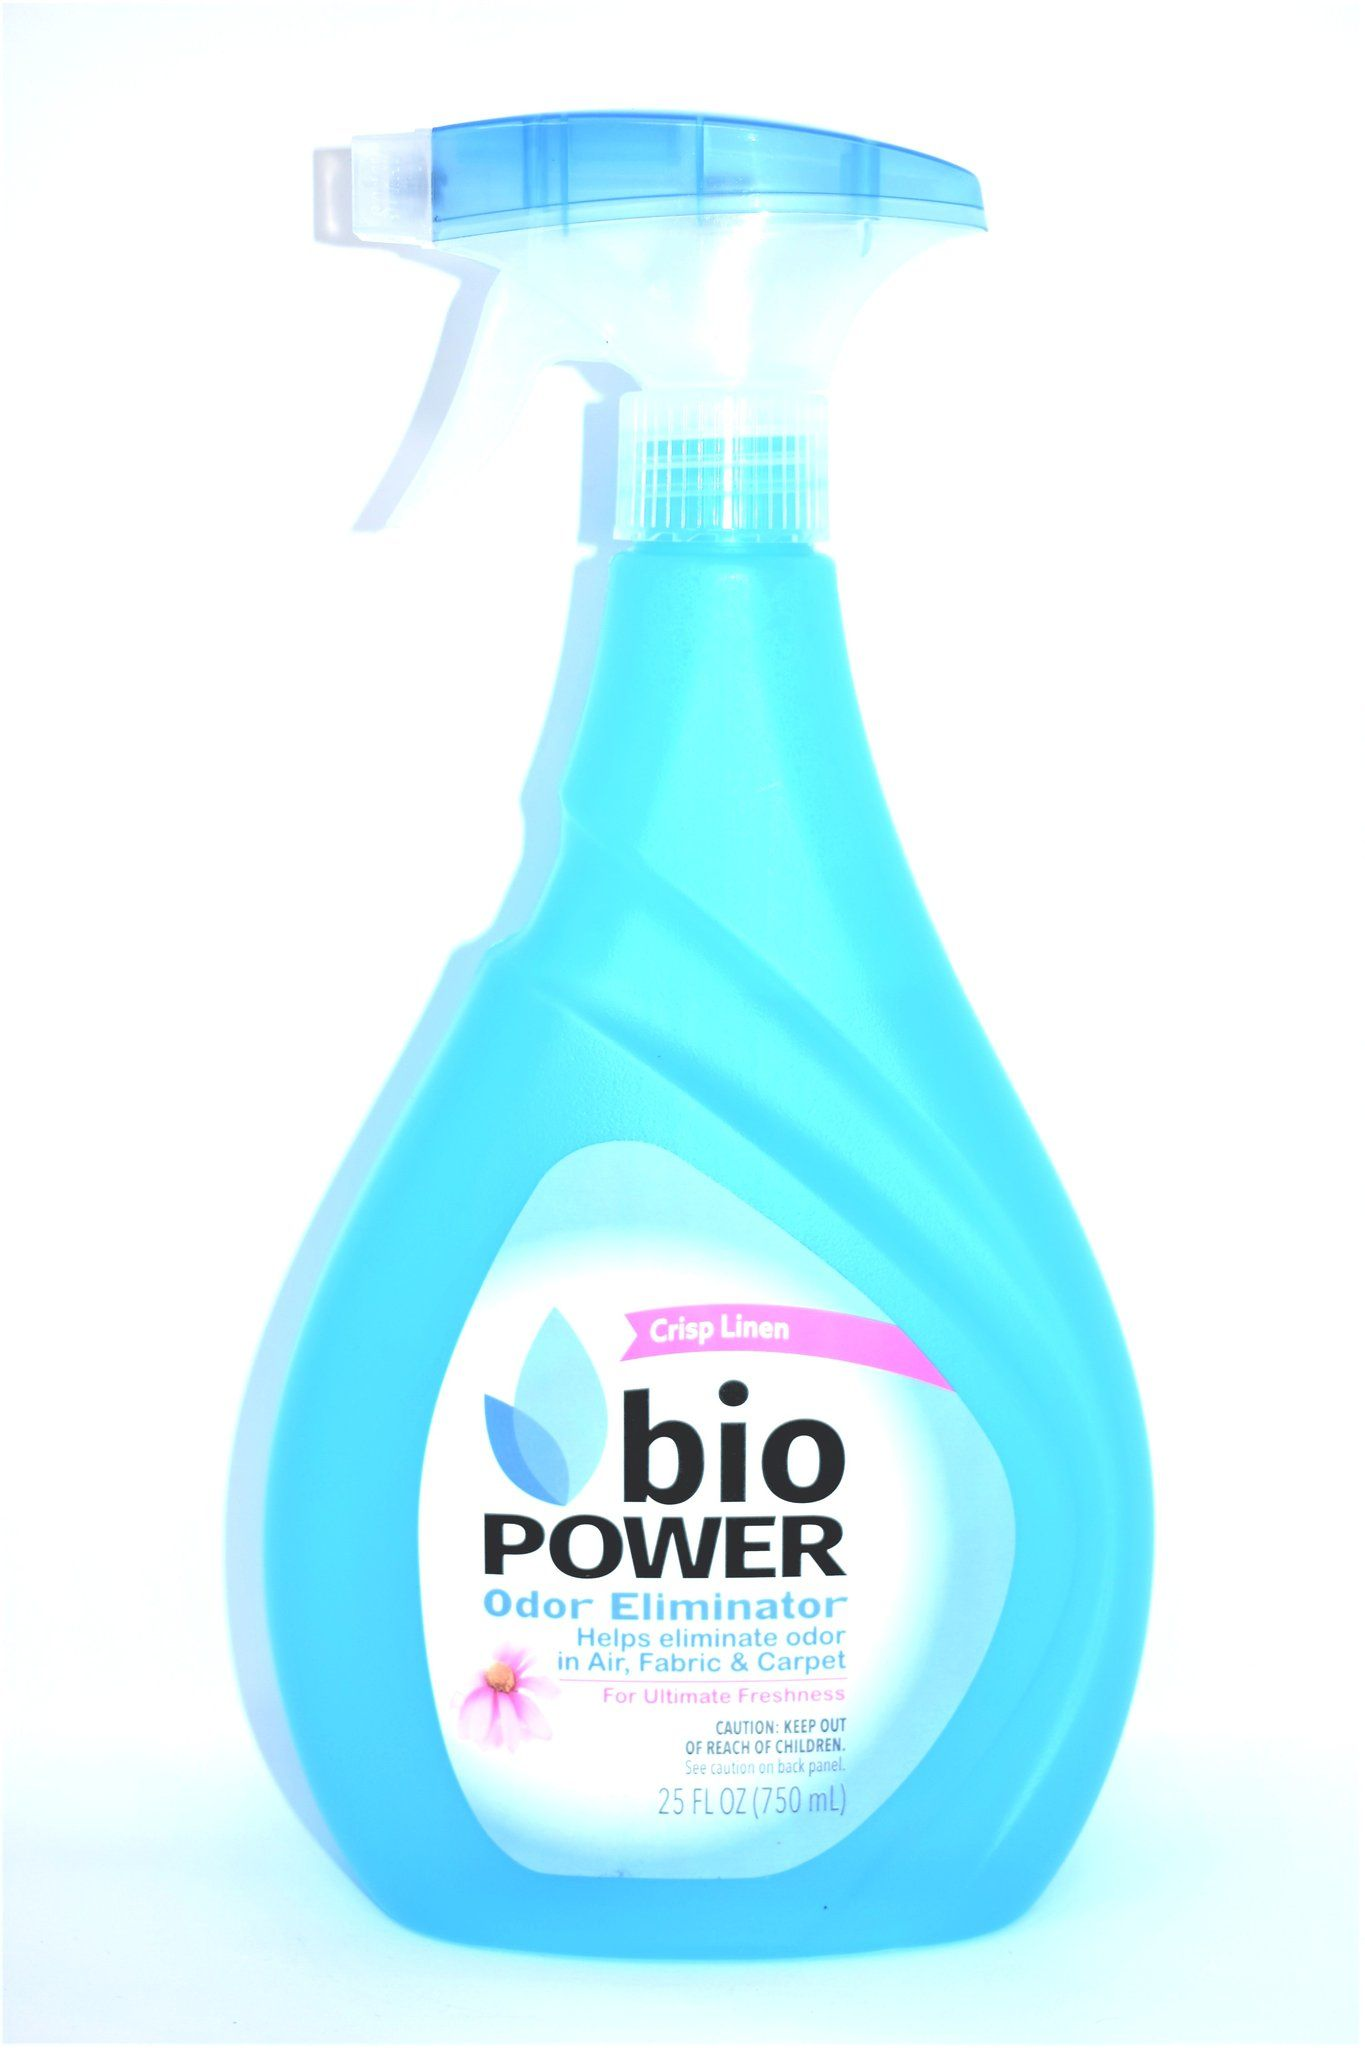 Bio Power Odor Eliminator Crisp Linen Scent, 25 fl oz